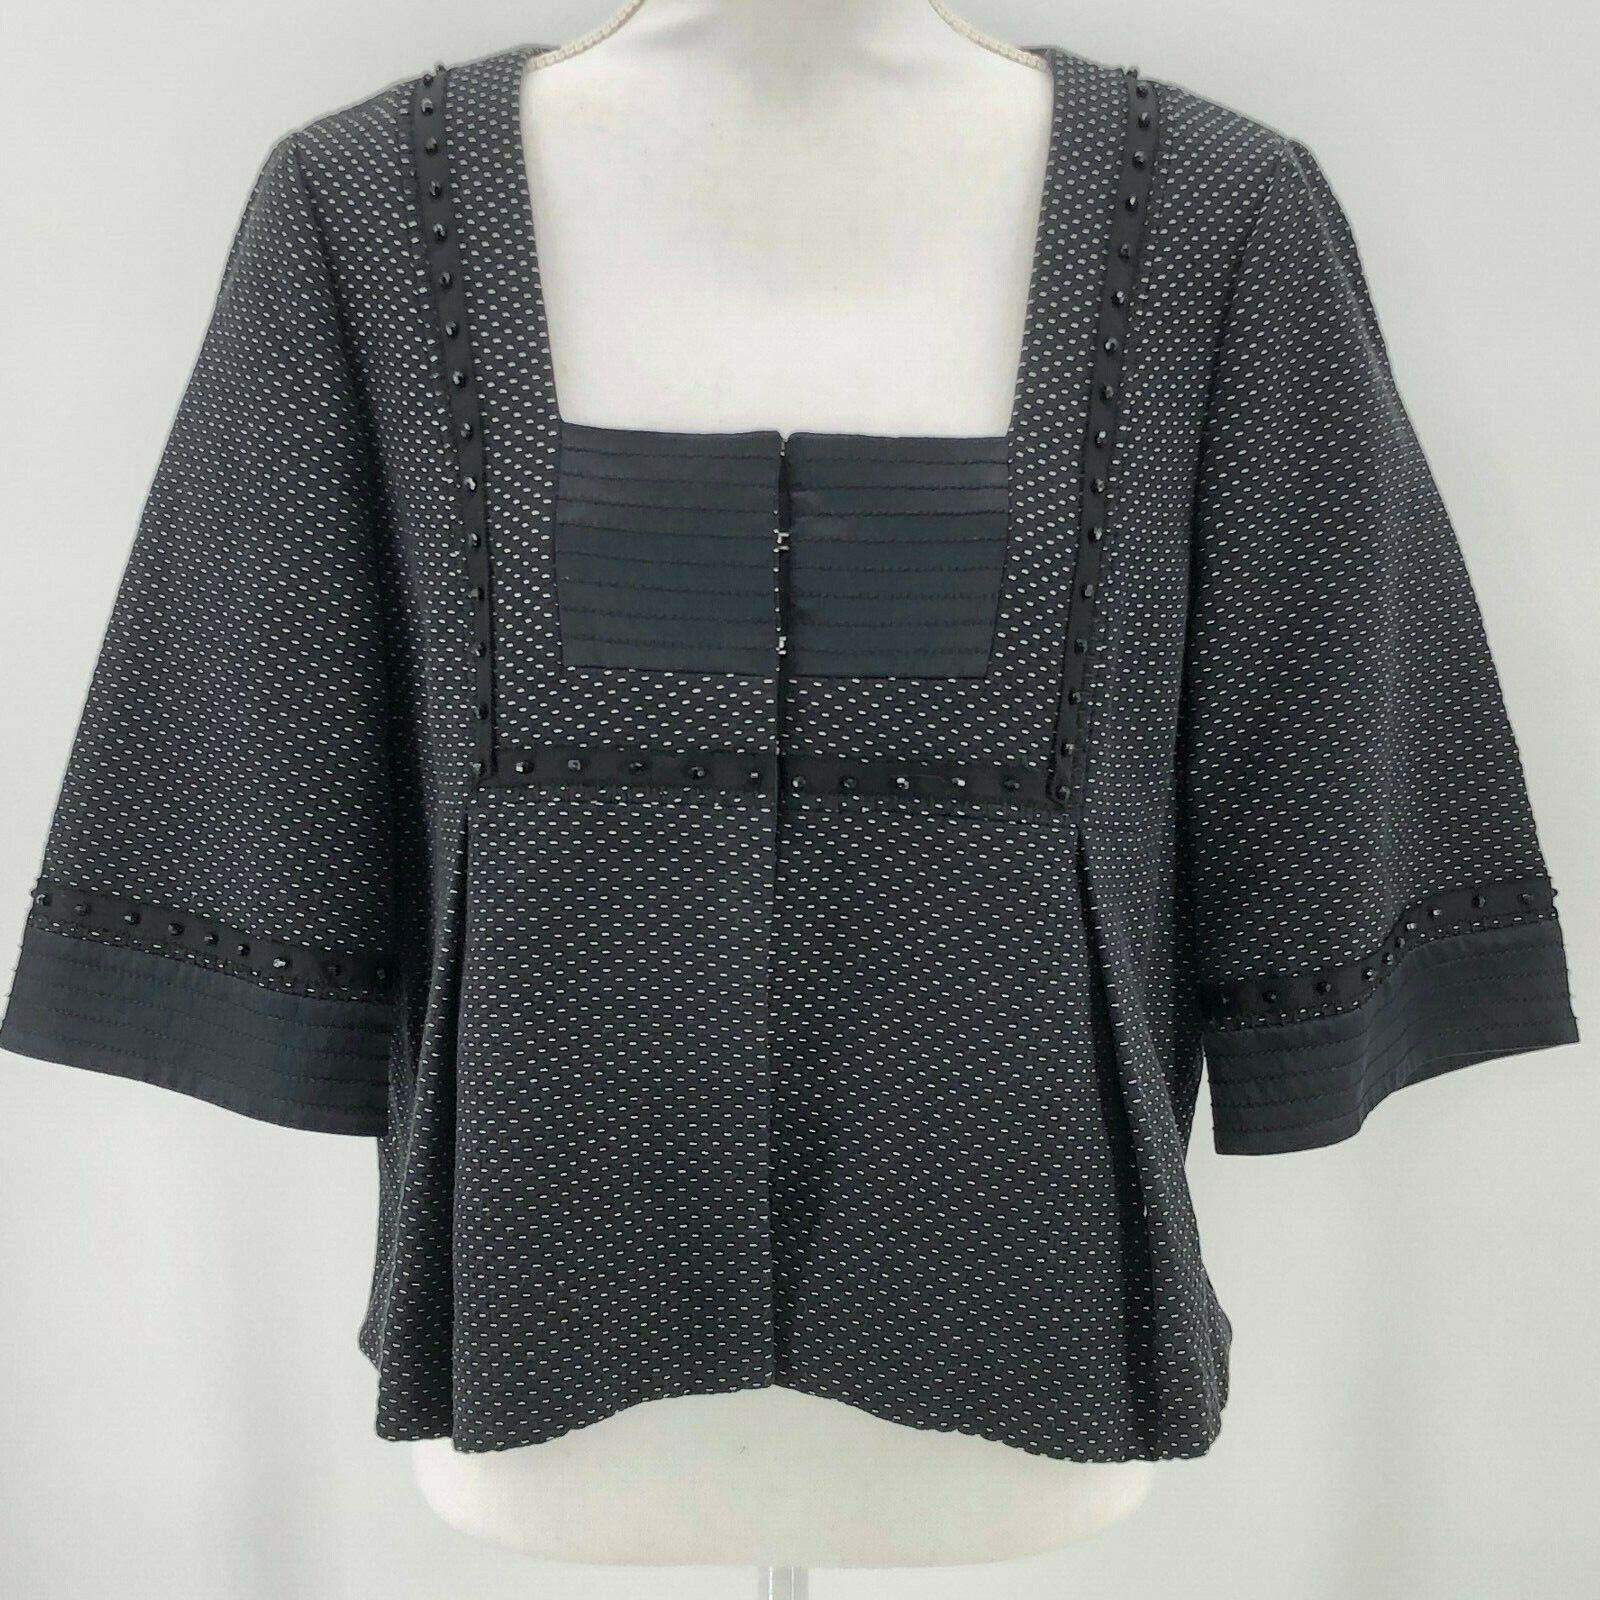 Badgley Mischka Womens Large Boxy Cropped Beaded Jacket Blazer Career Party